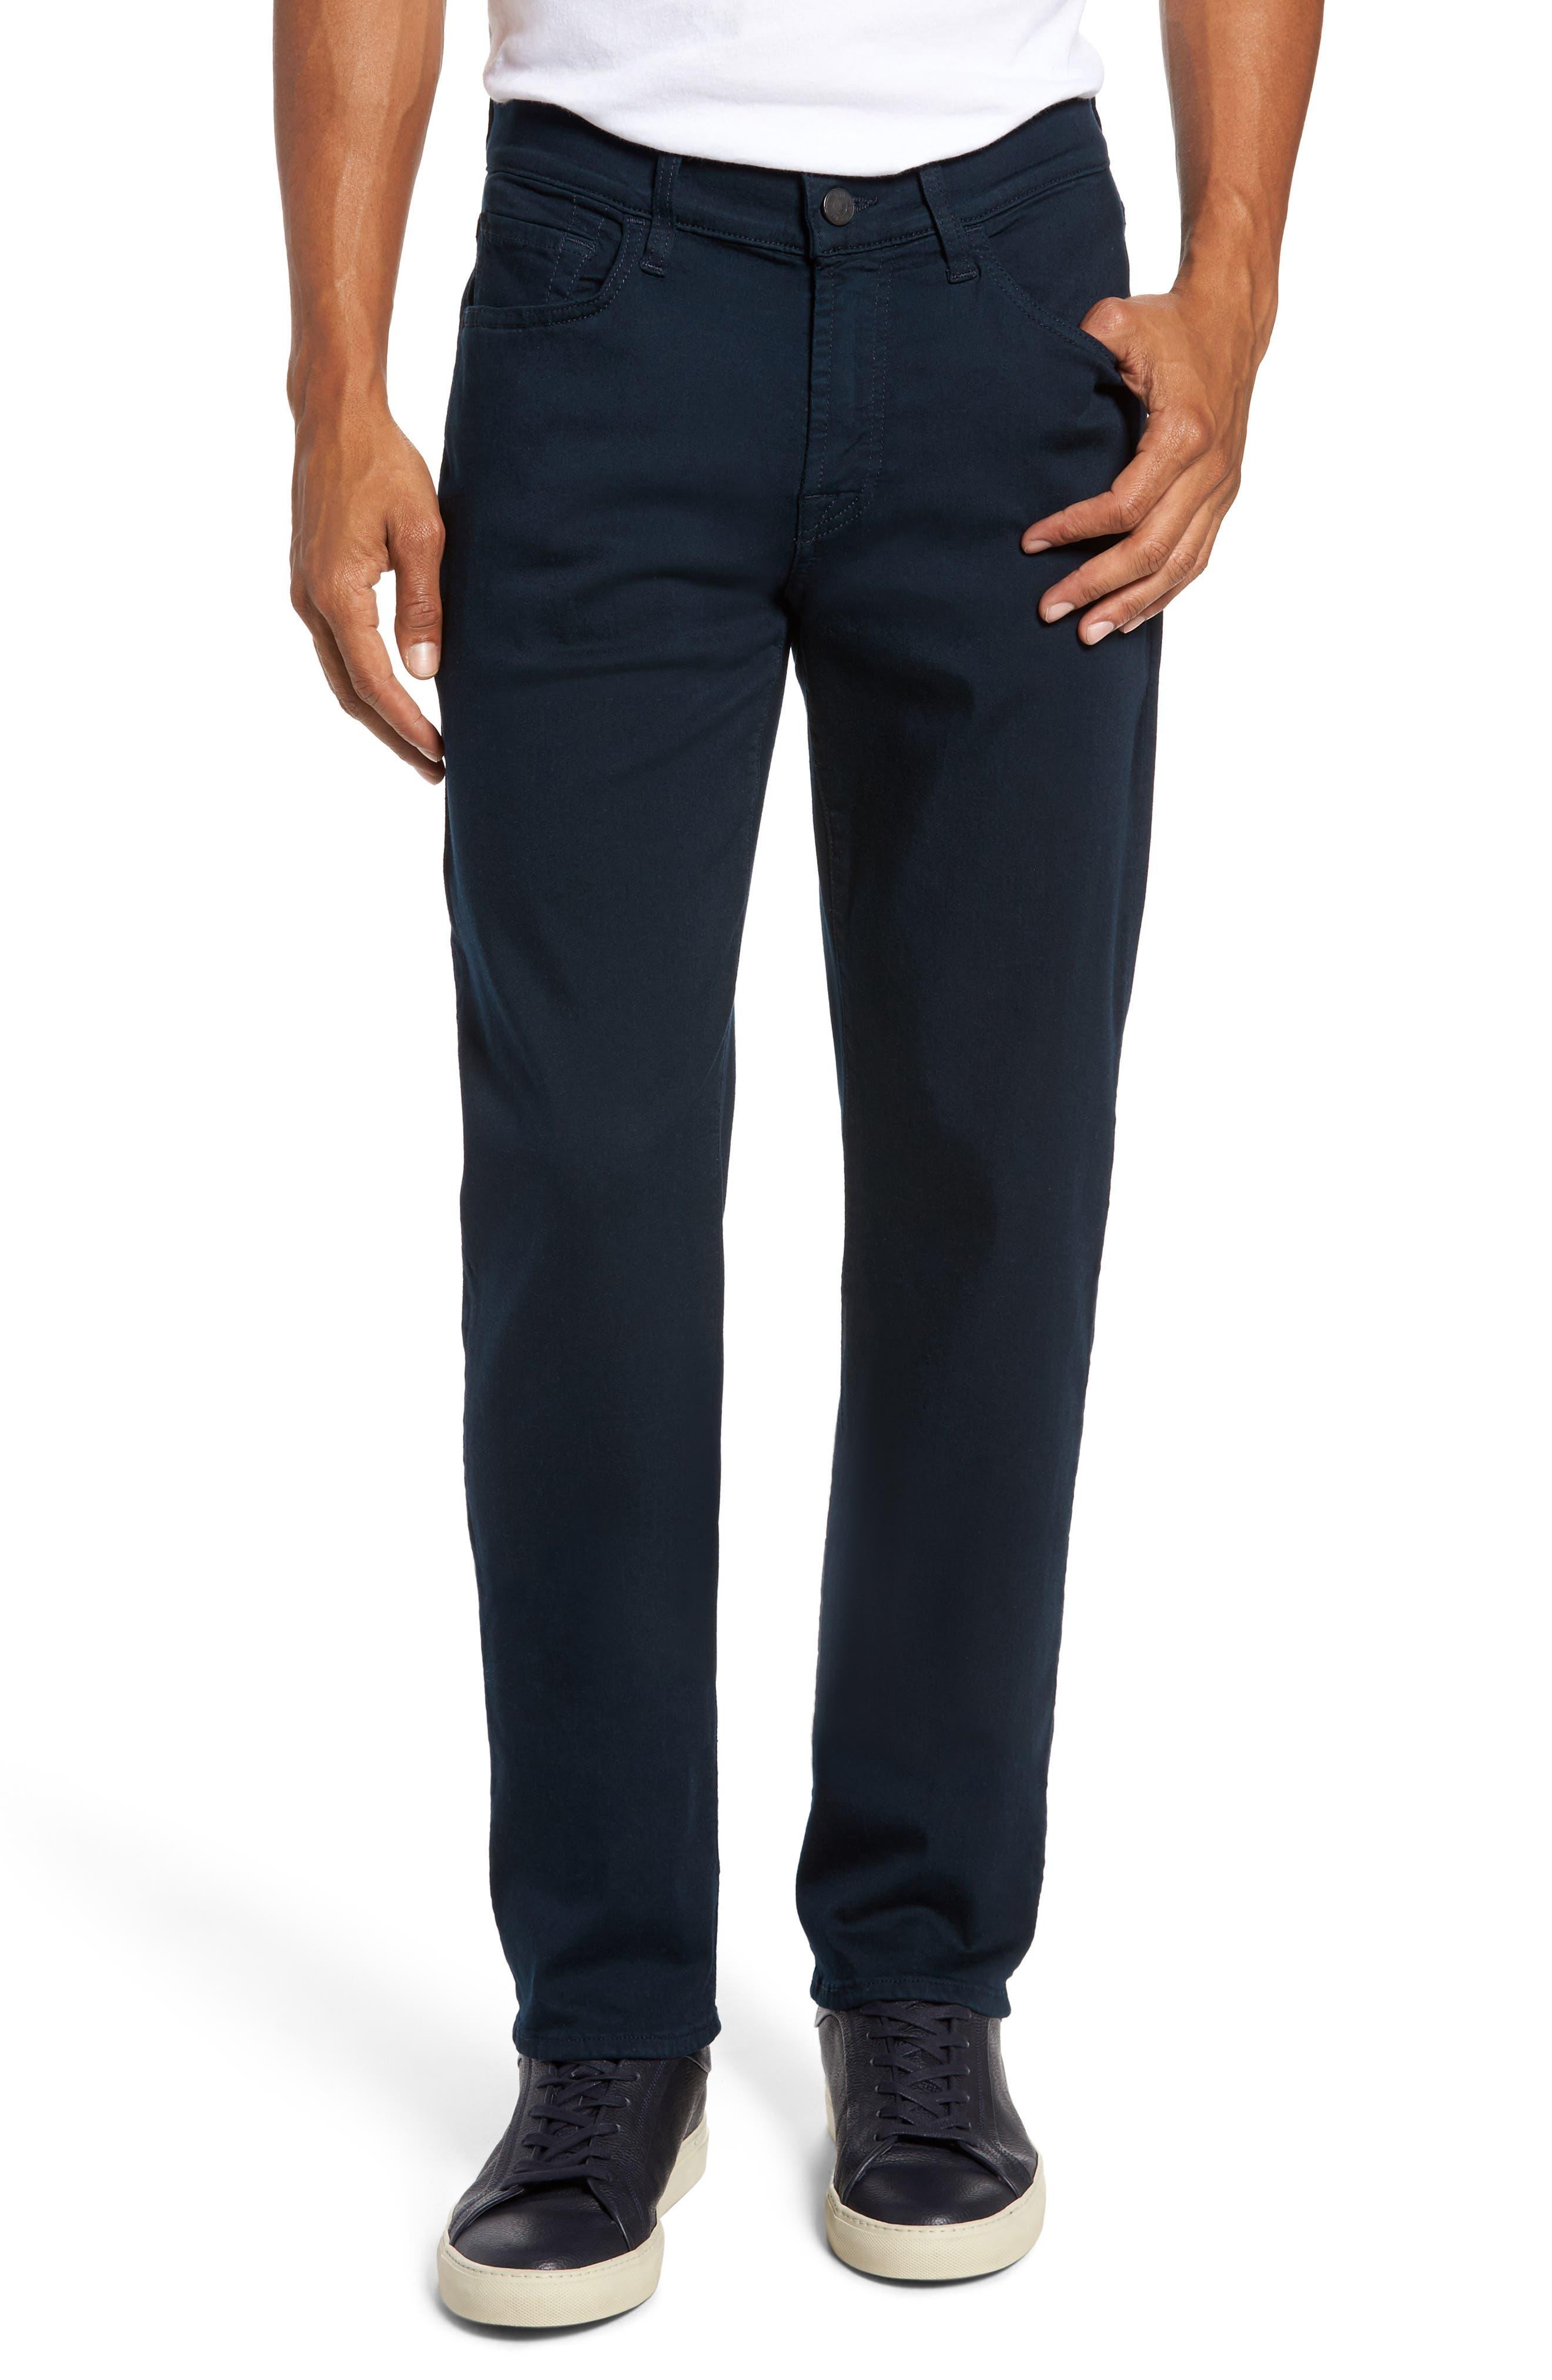 Slimmy Slim Fit Jeans,                         Main,                         color,